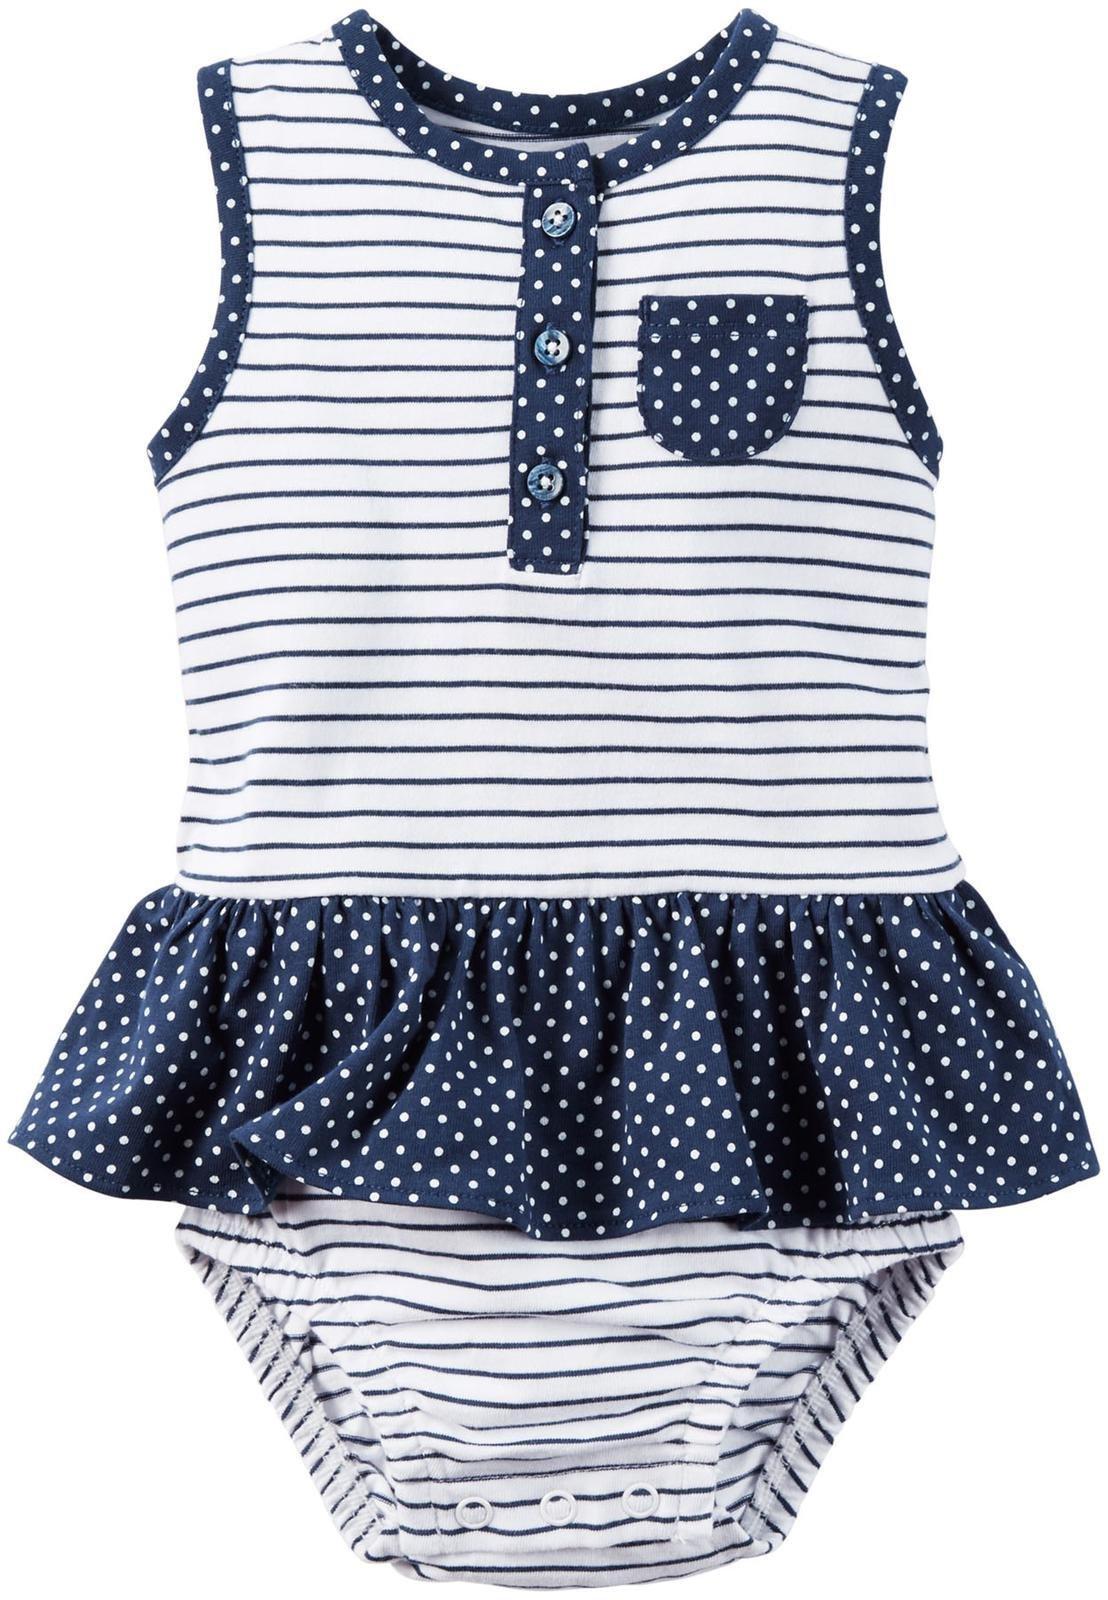 Carter's Baby Girls' 1 Pc 118h108, Navy, 3 Months